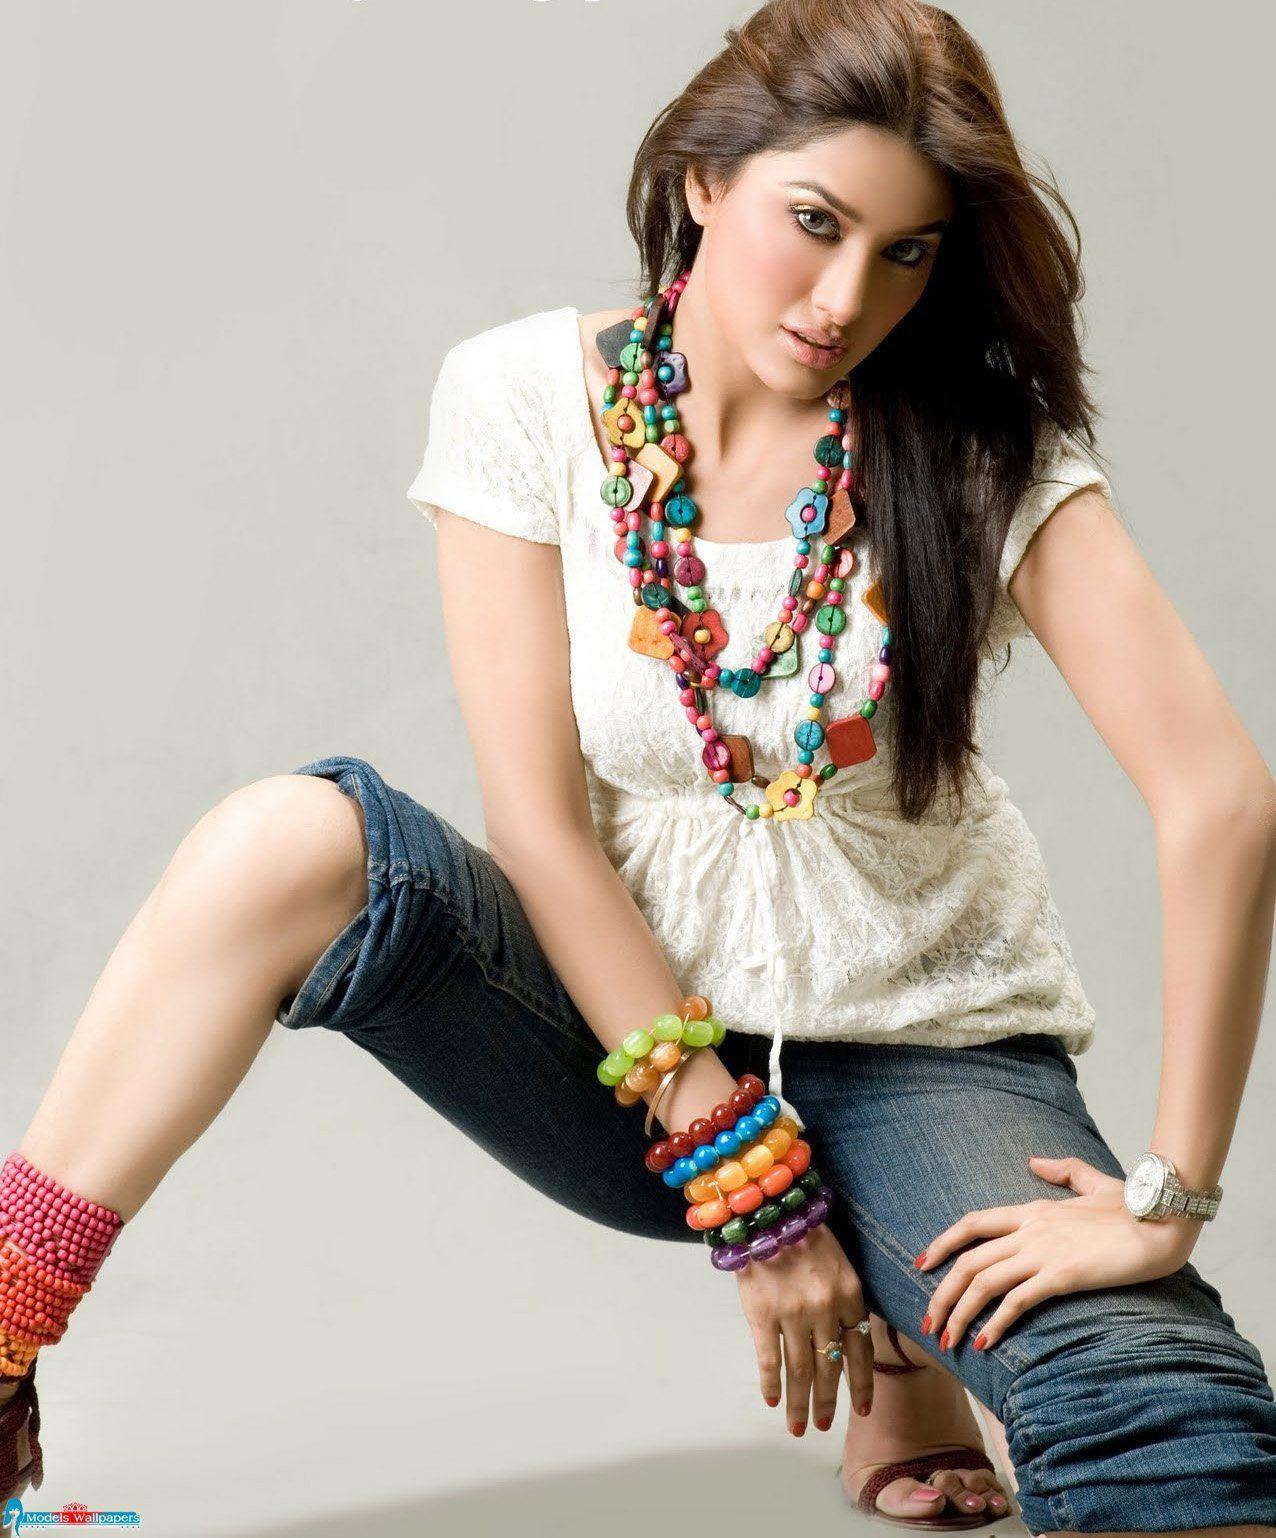 14 Pakistani Models Actress 2015 Hot Sizzling Lollywood Beauty